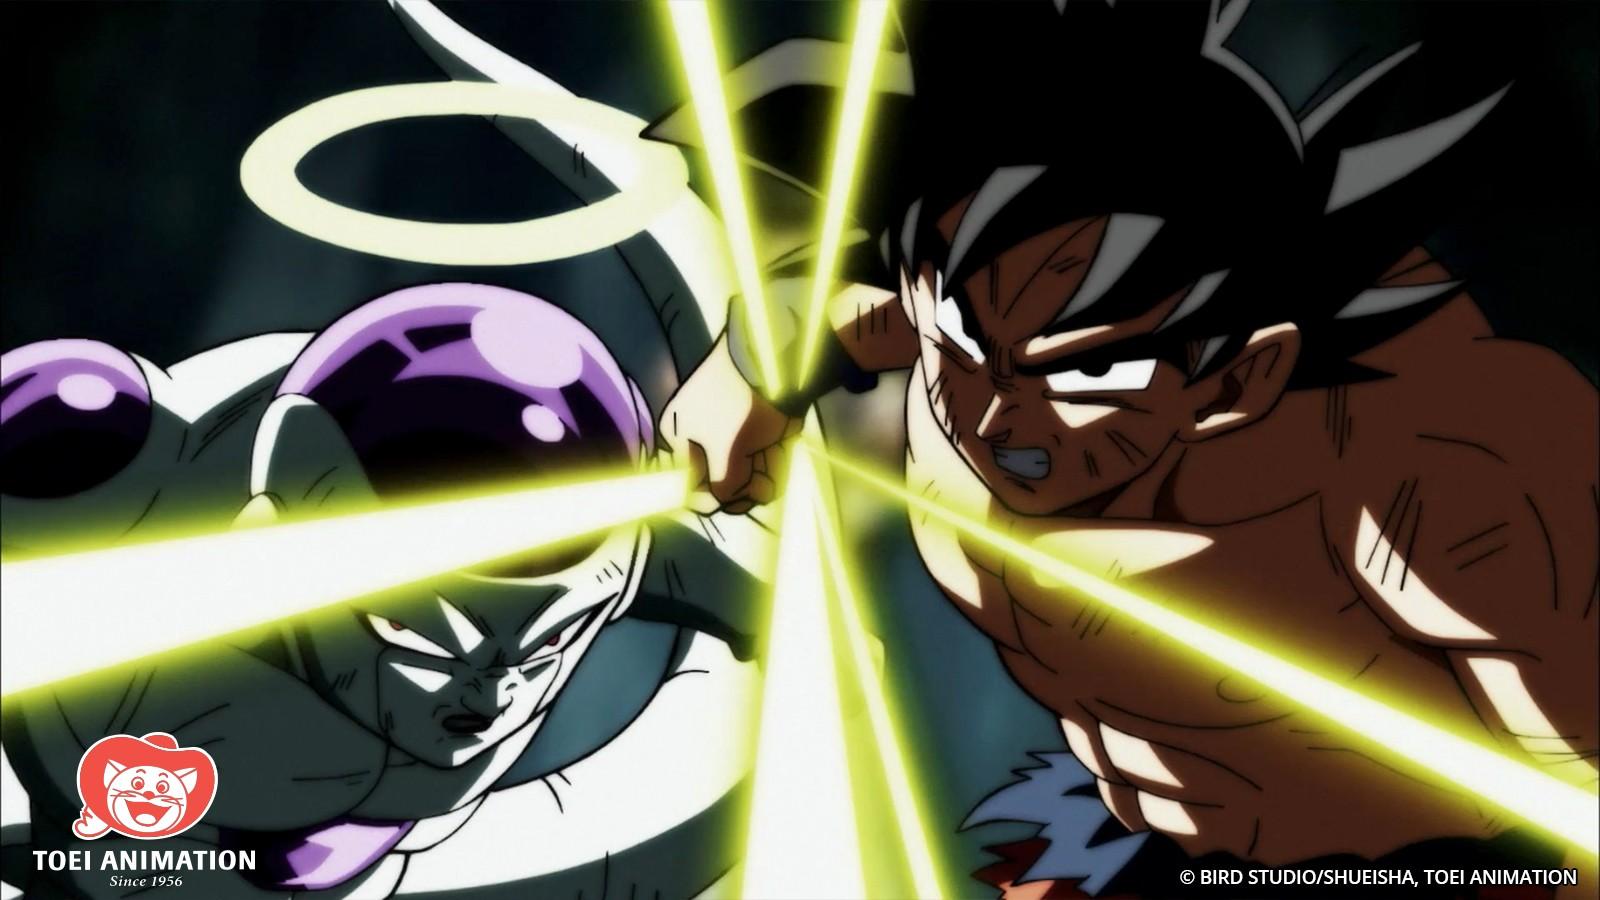 Goku Frieza Tournament of Power Team Up Dragon Ball Super